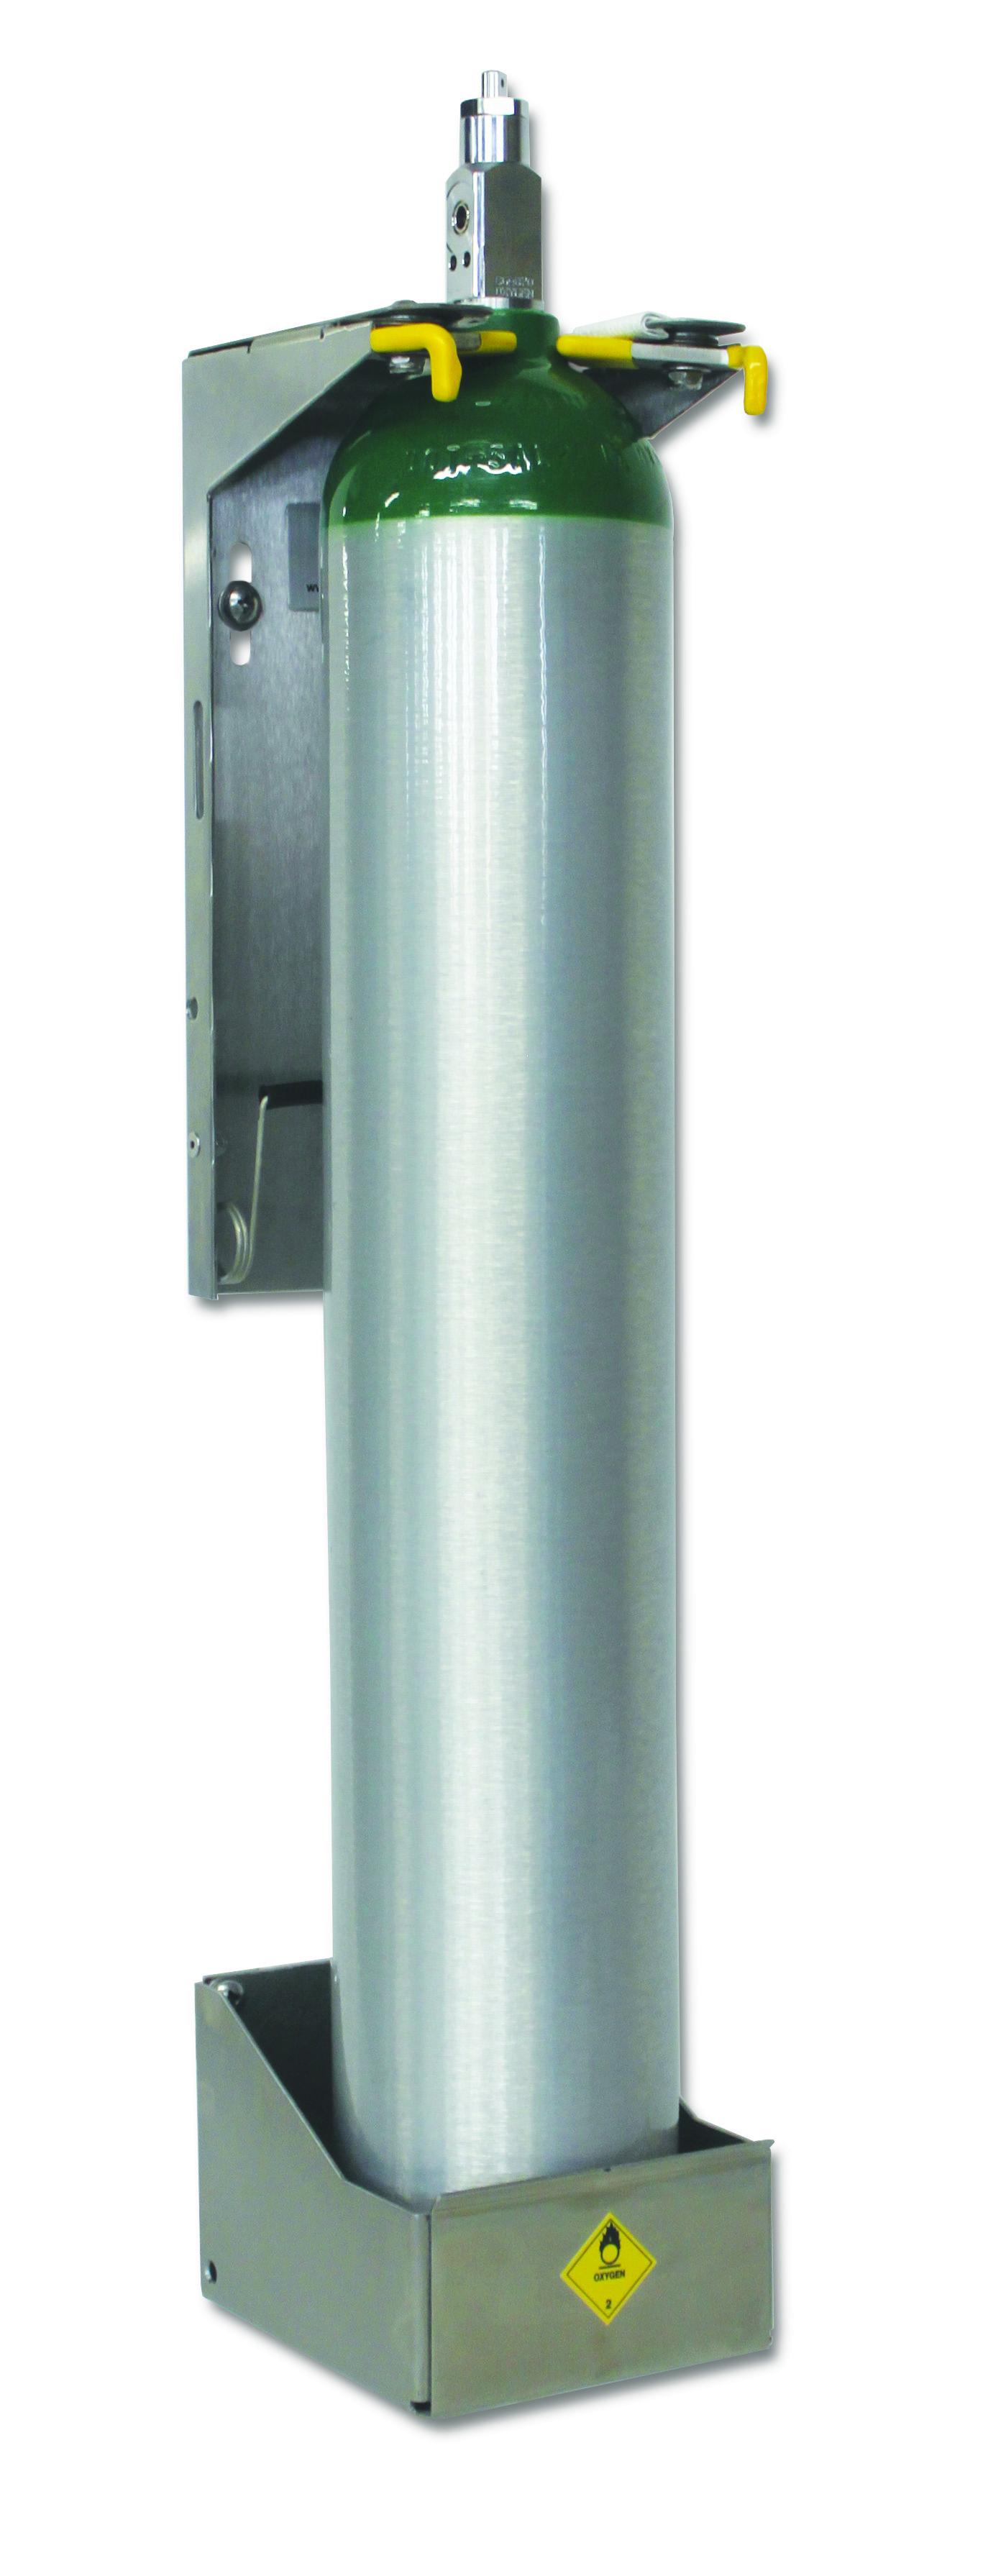 "Strapless ""E"" Cylinder Bracket for All-in-One Regulators"